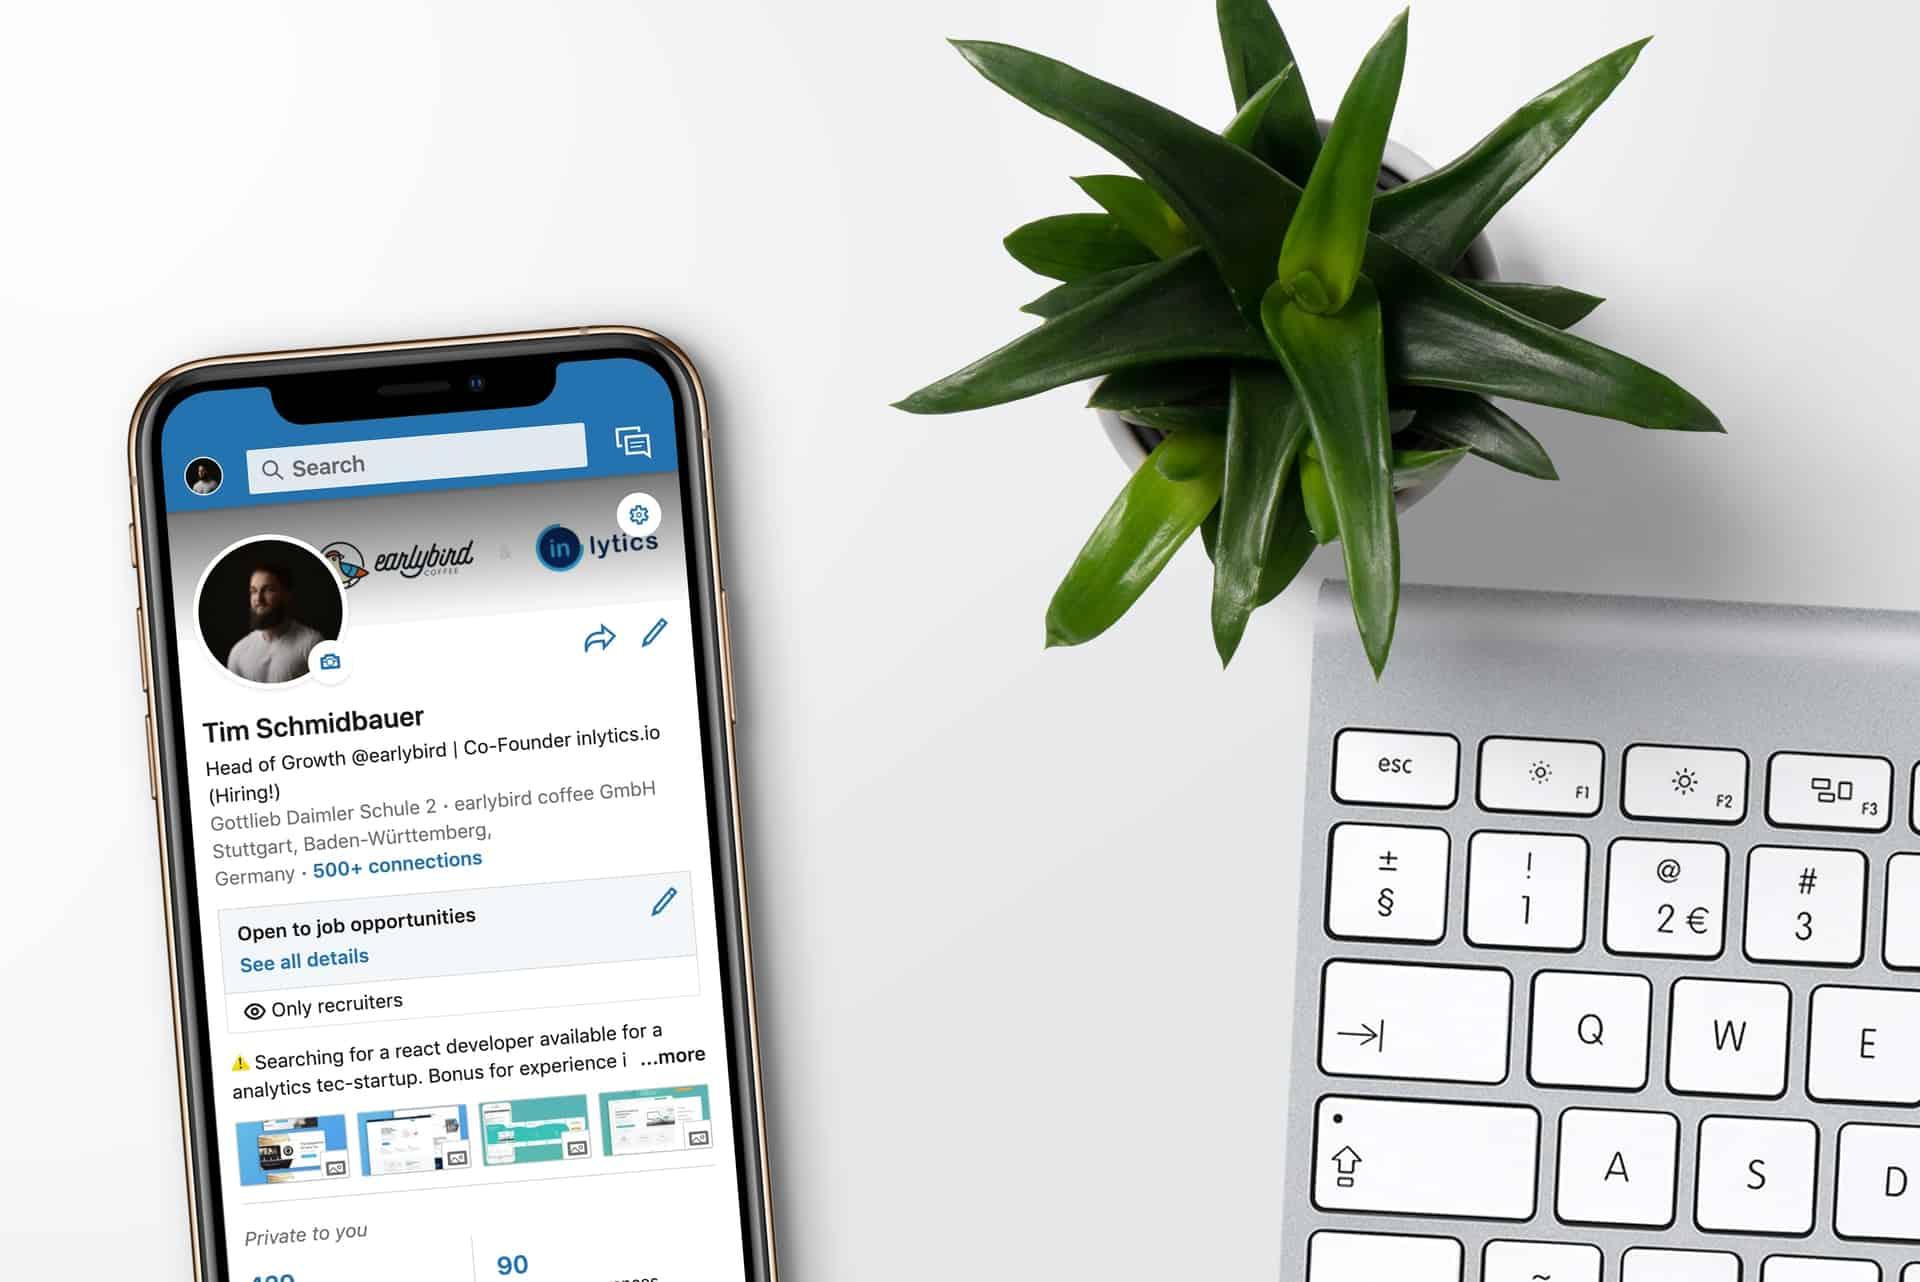 Phone showing LinkedIn profile